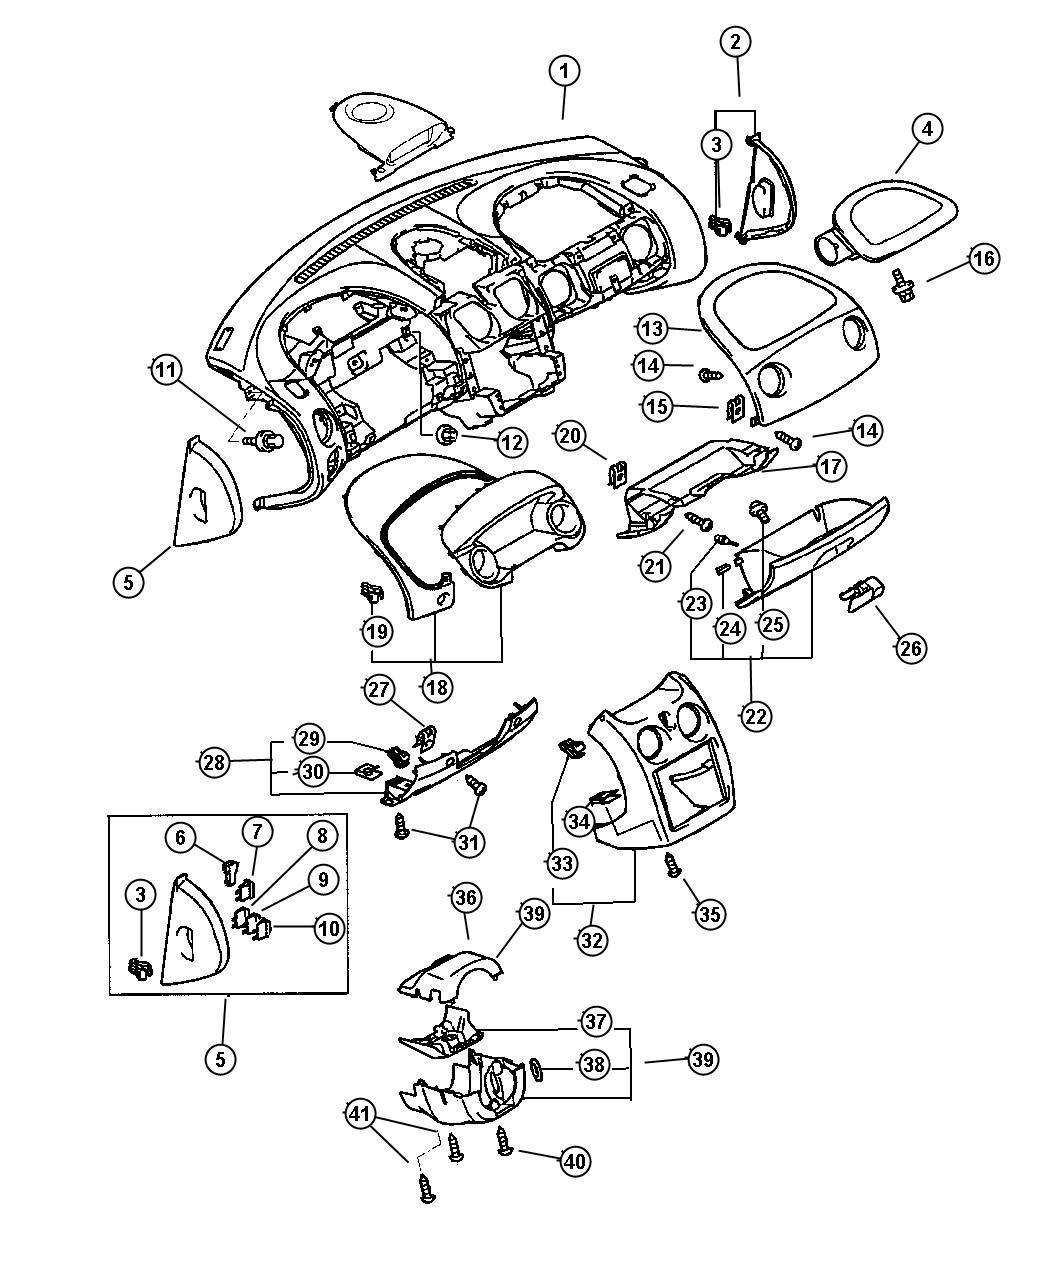 Chrysler Sebring Fuse Mini 10 Amp Red Electrical